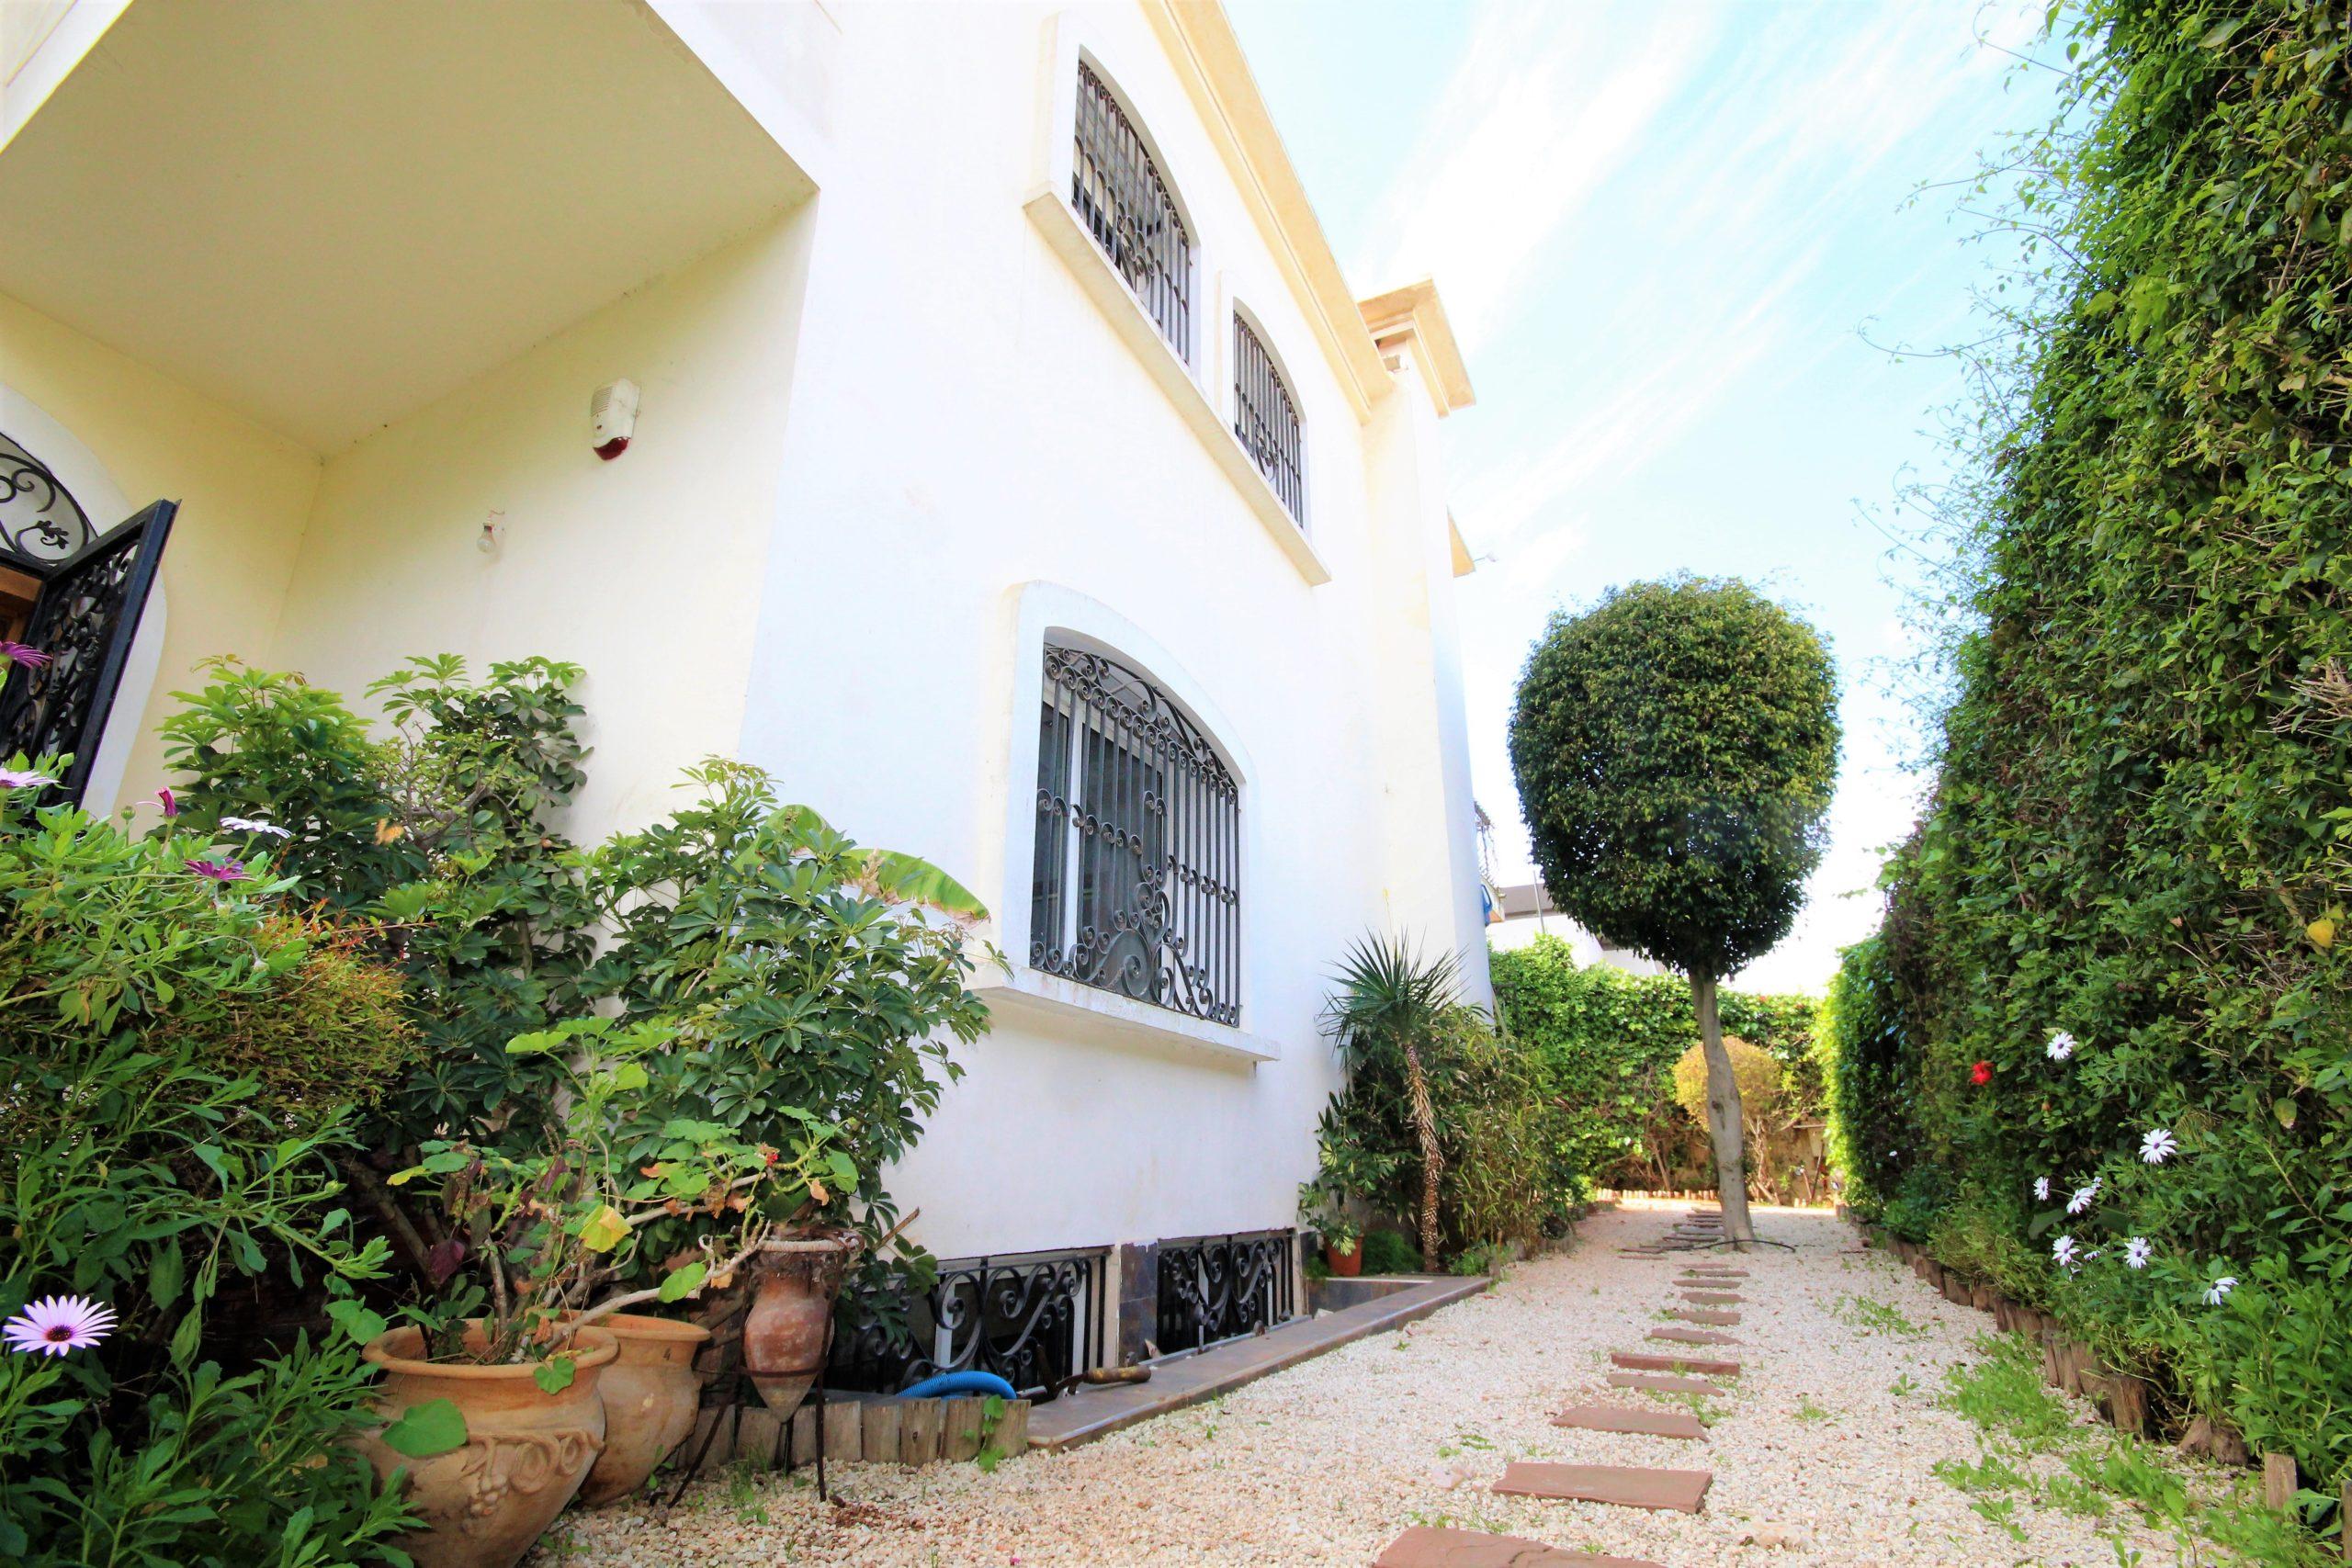 Casablanca, Ain diab, vend villa 4 chambres avec piscine vue mer